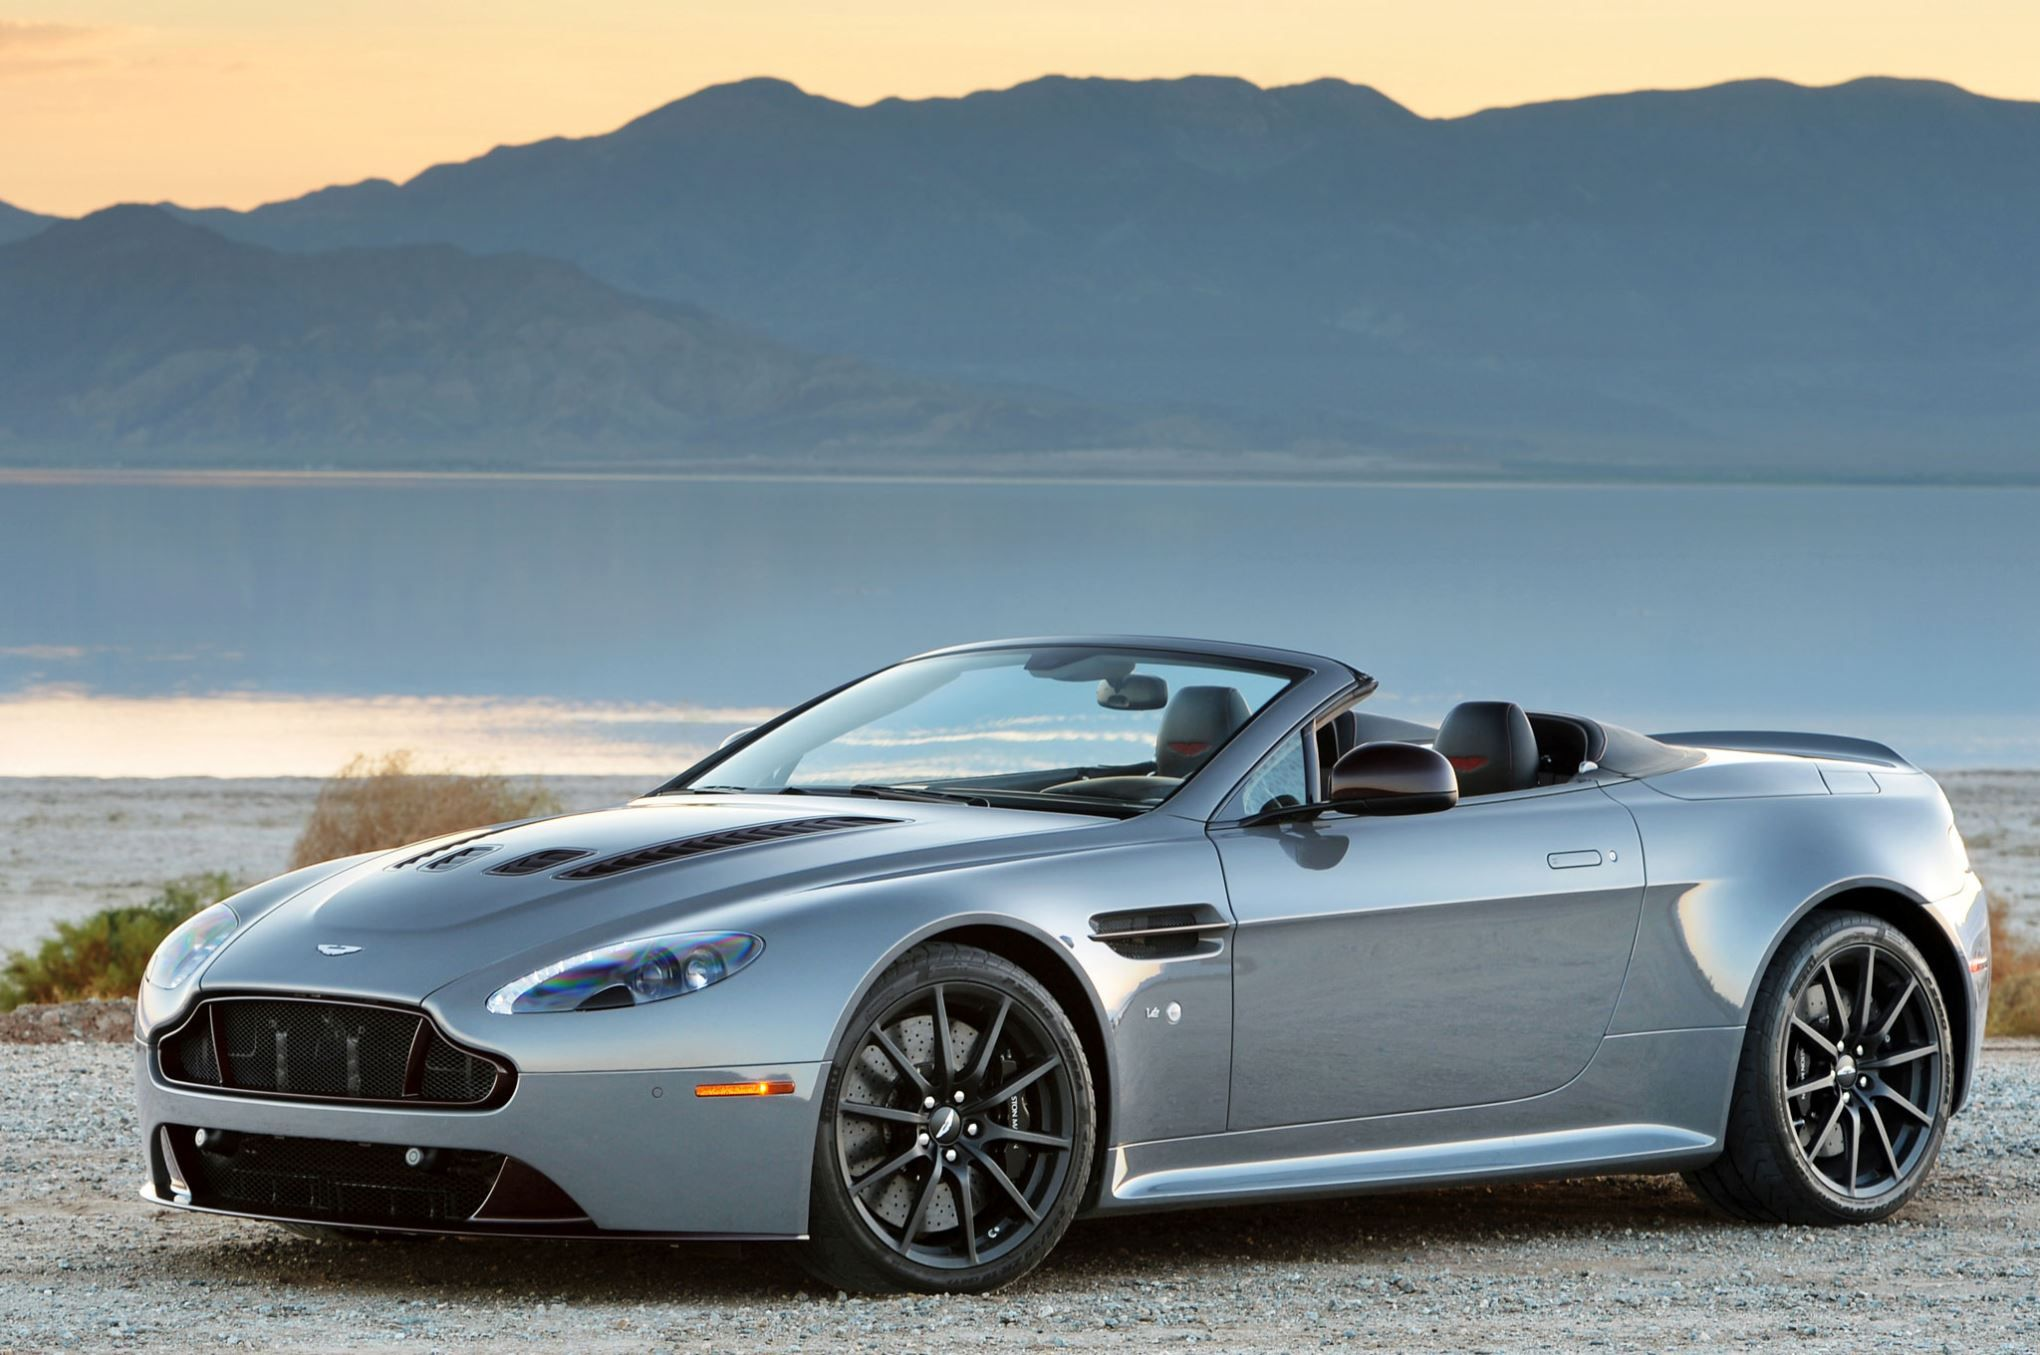 Daimler Again Claims Zero Interest In Taking Over Aston Martin Aston Martin V12 Vantage Aston Martin V12 Aston Martin